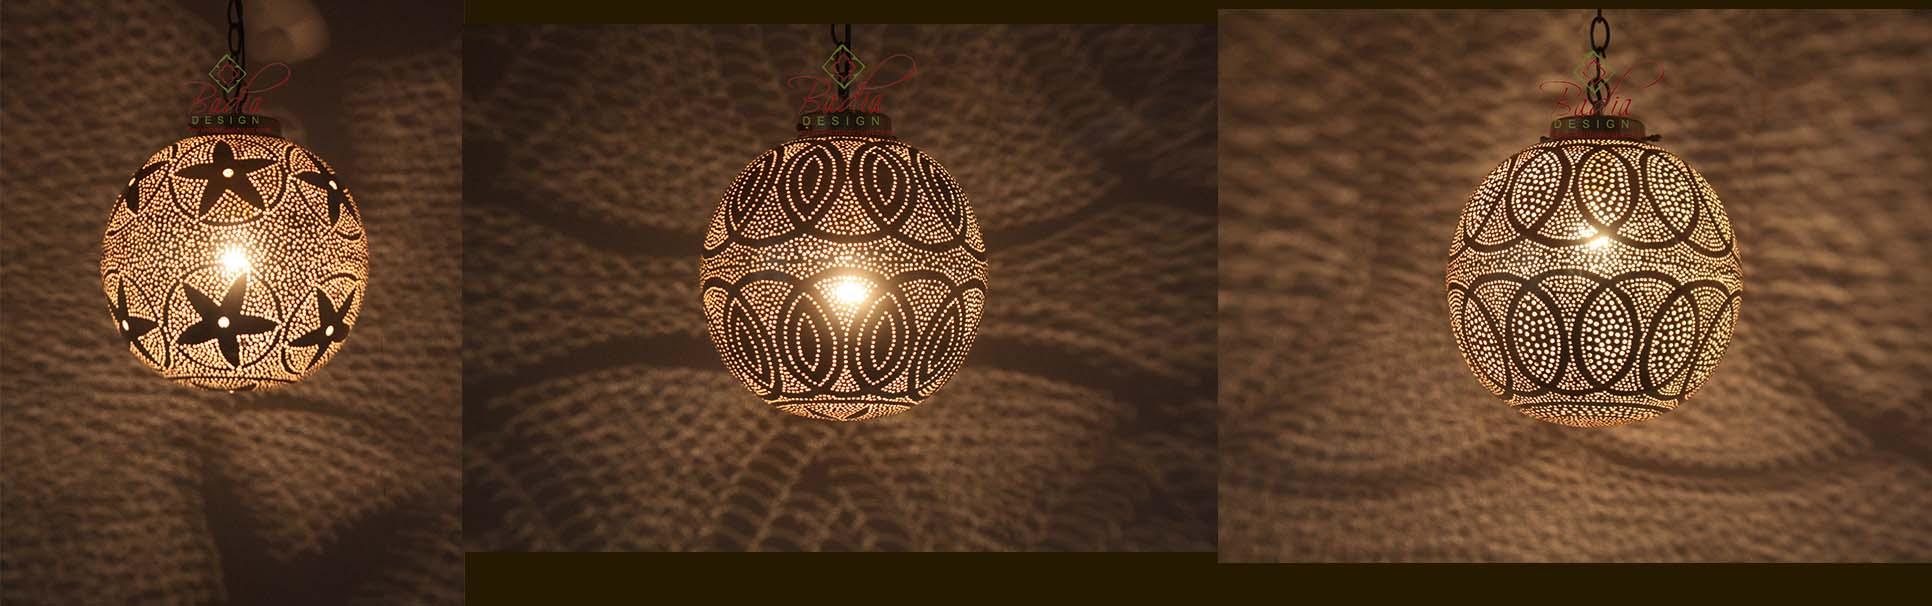 moroccan-silver-lantern-lig328-4.jpg